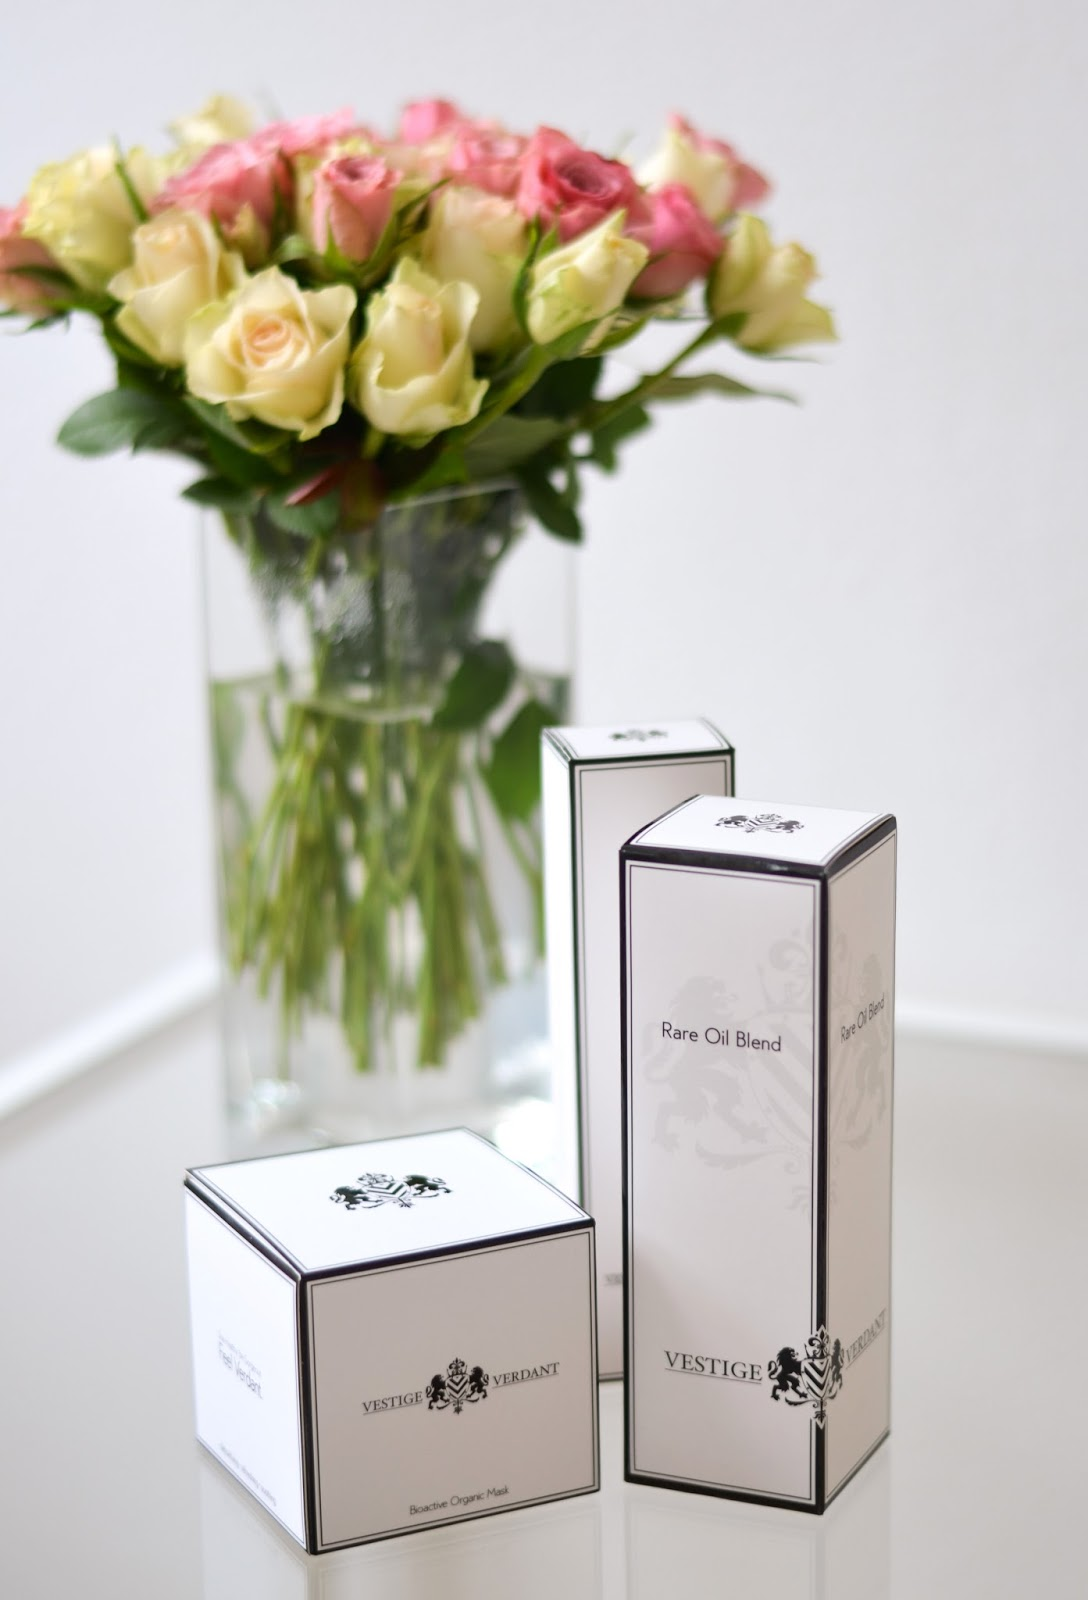 vestige verdant luxury organic skincare